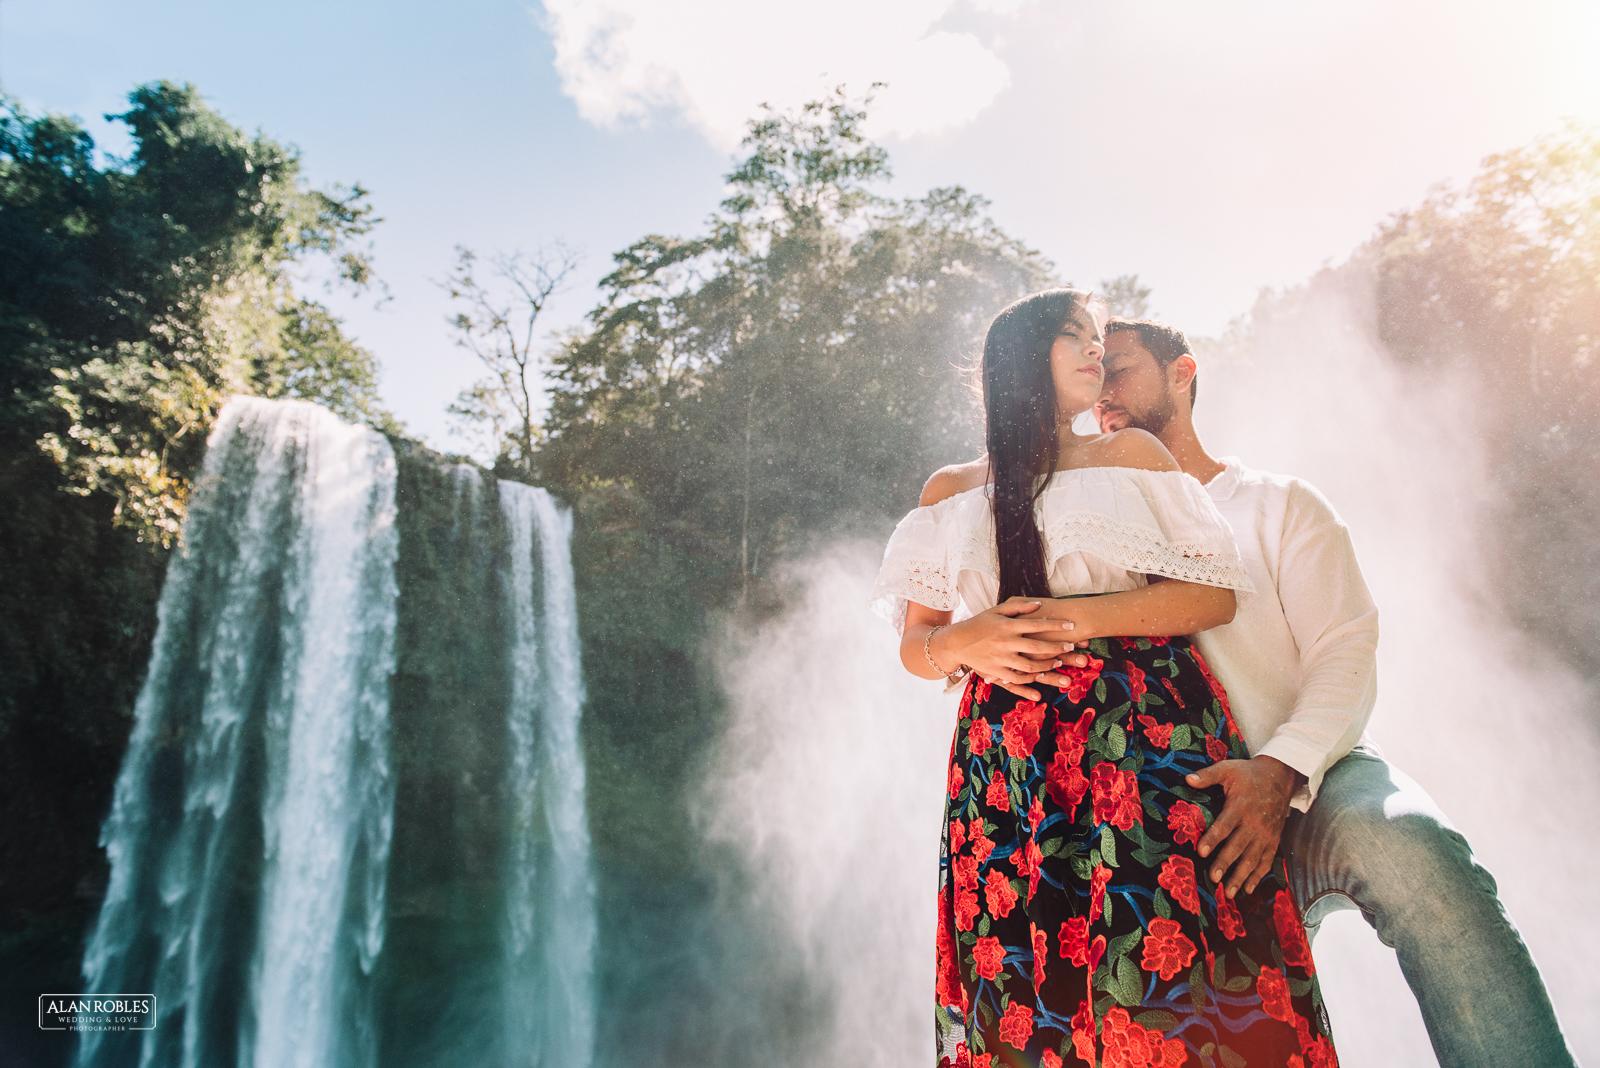 Fotografo de bodas Alan Robles-Pre boda Chiapas-39